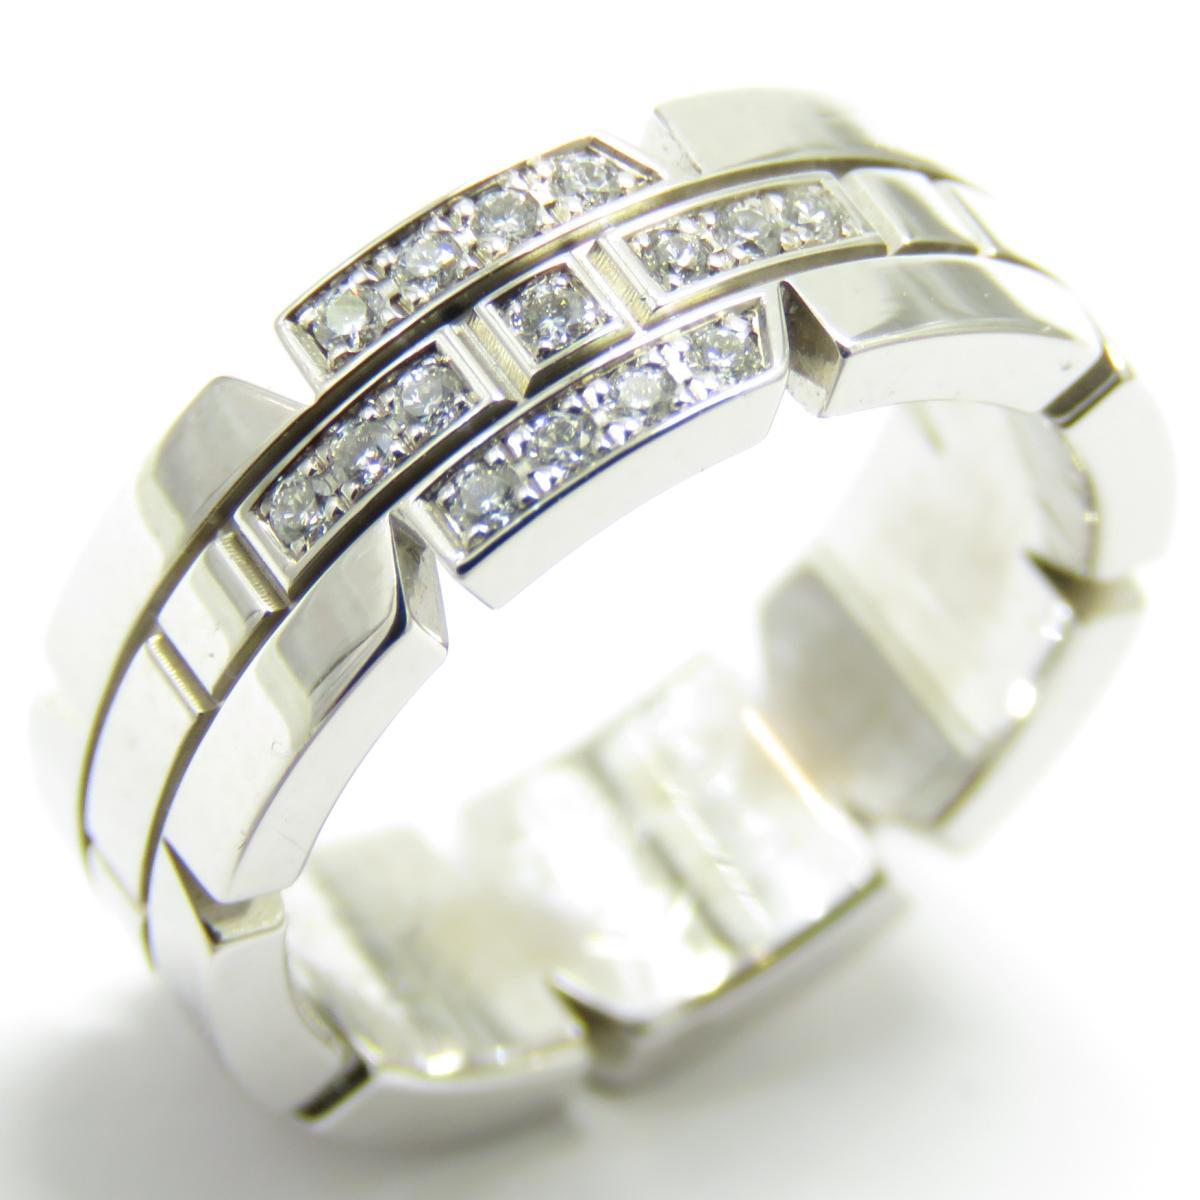 Cartier(カルティエ)/タンクフランセーズハーフダイヤ リング 指輪/リング//K18WG(750)ホワイトゴールド/【ランクA】/#49/9号【中古】